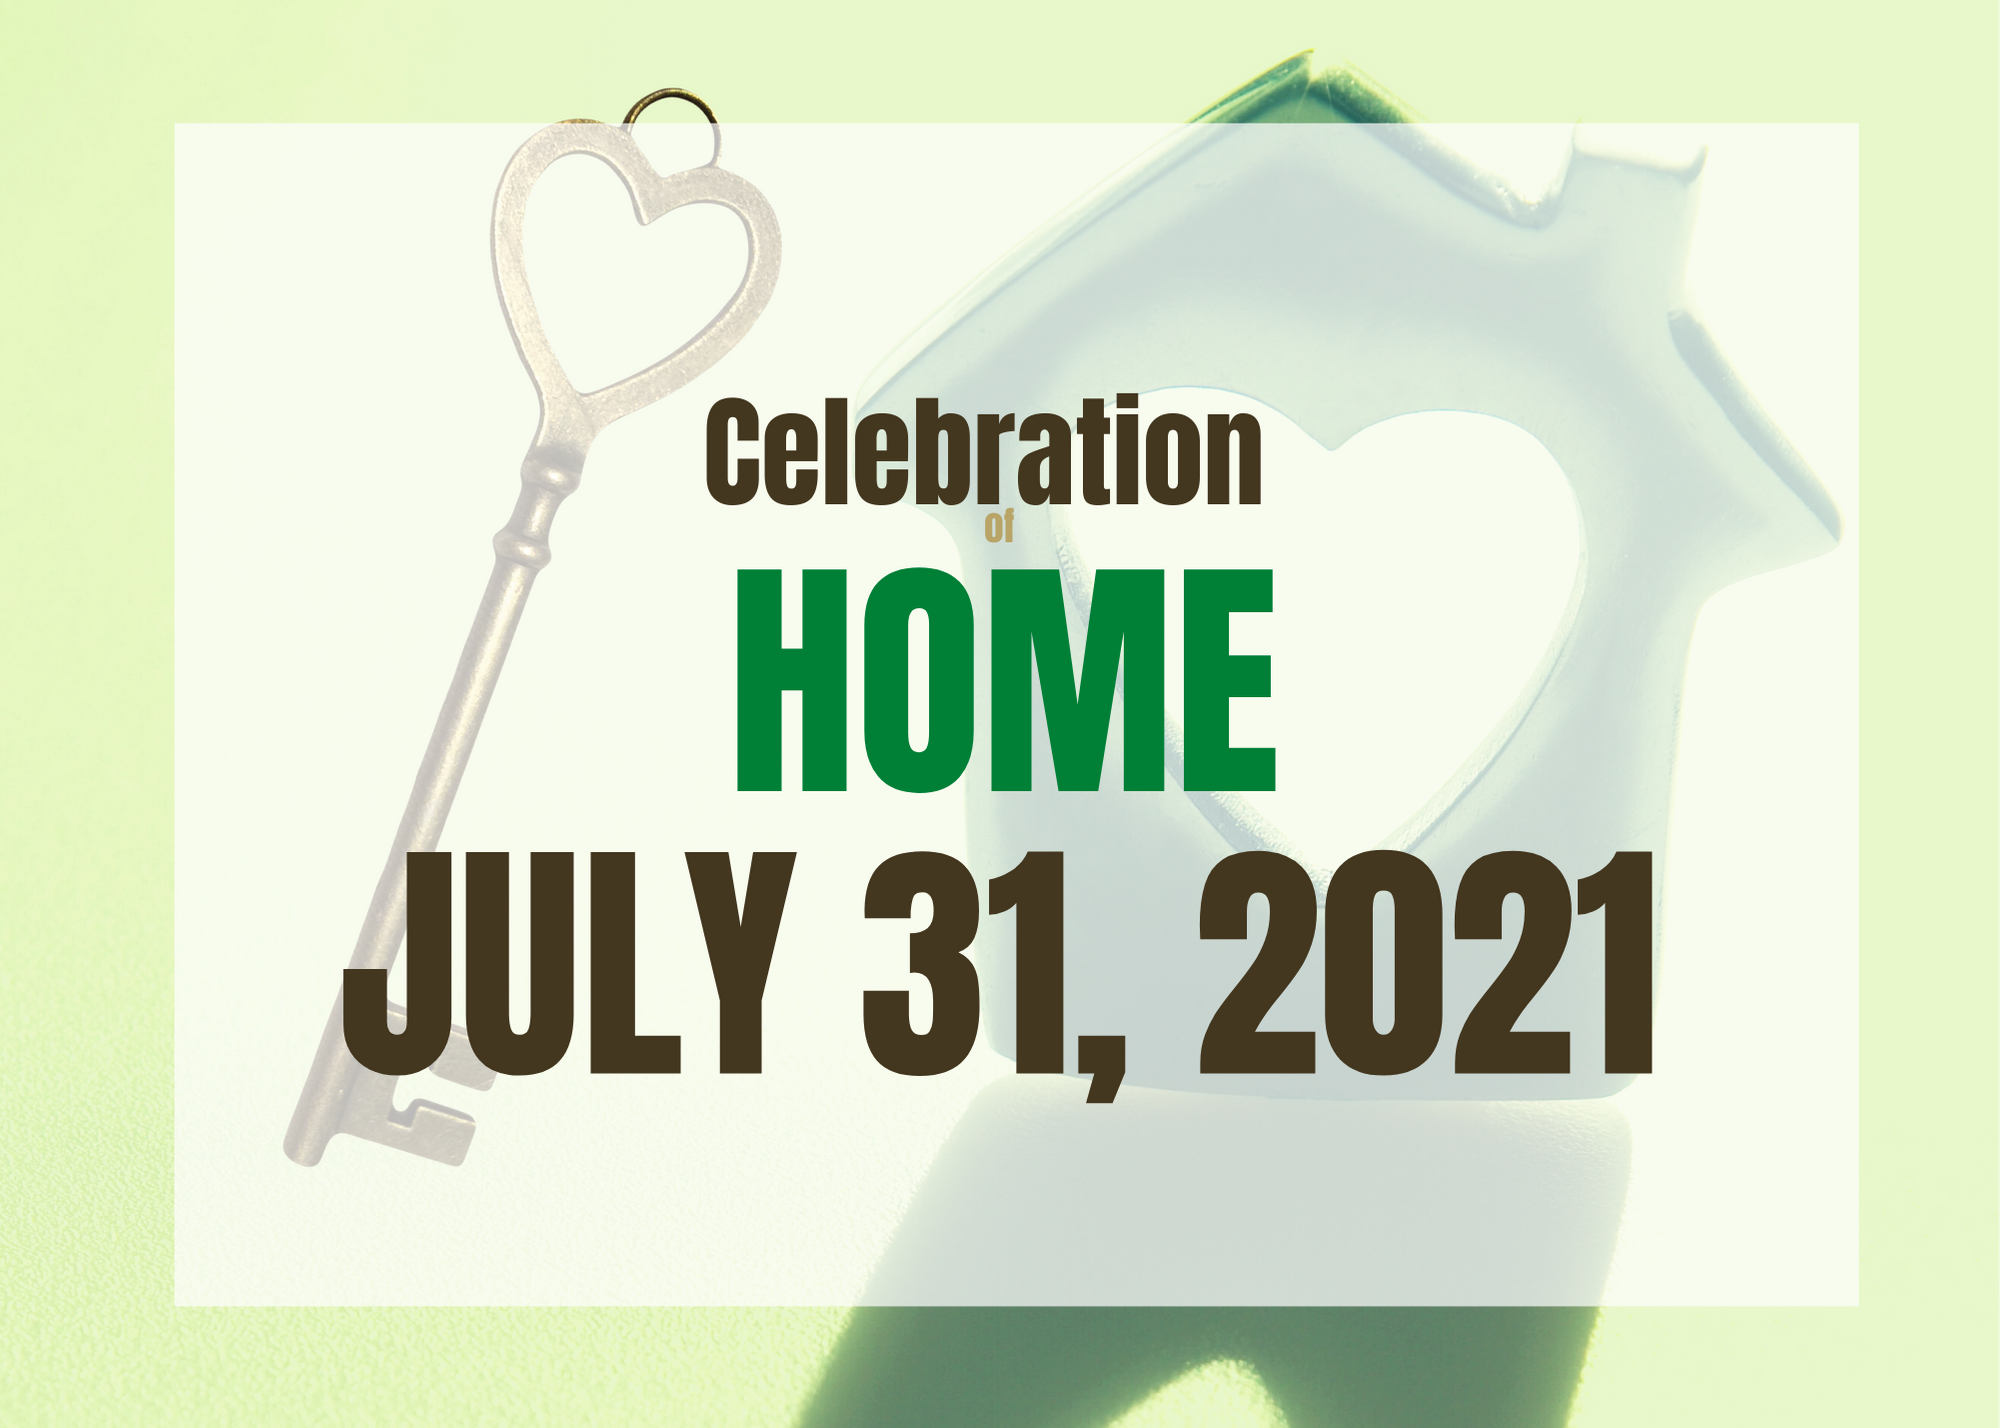 Celebration of HOME